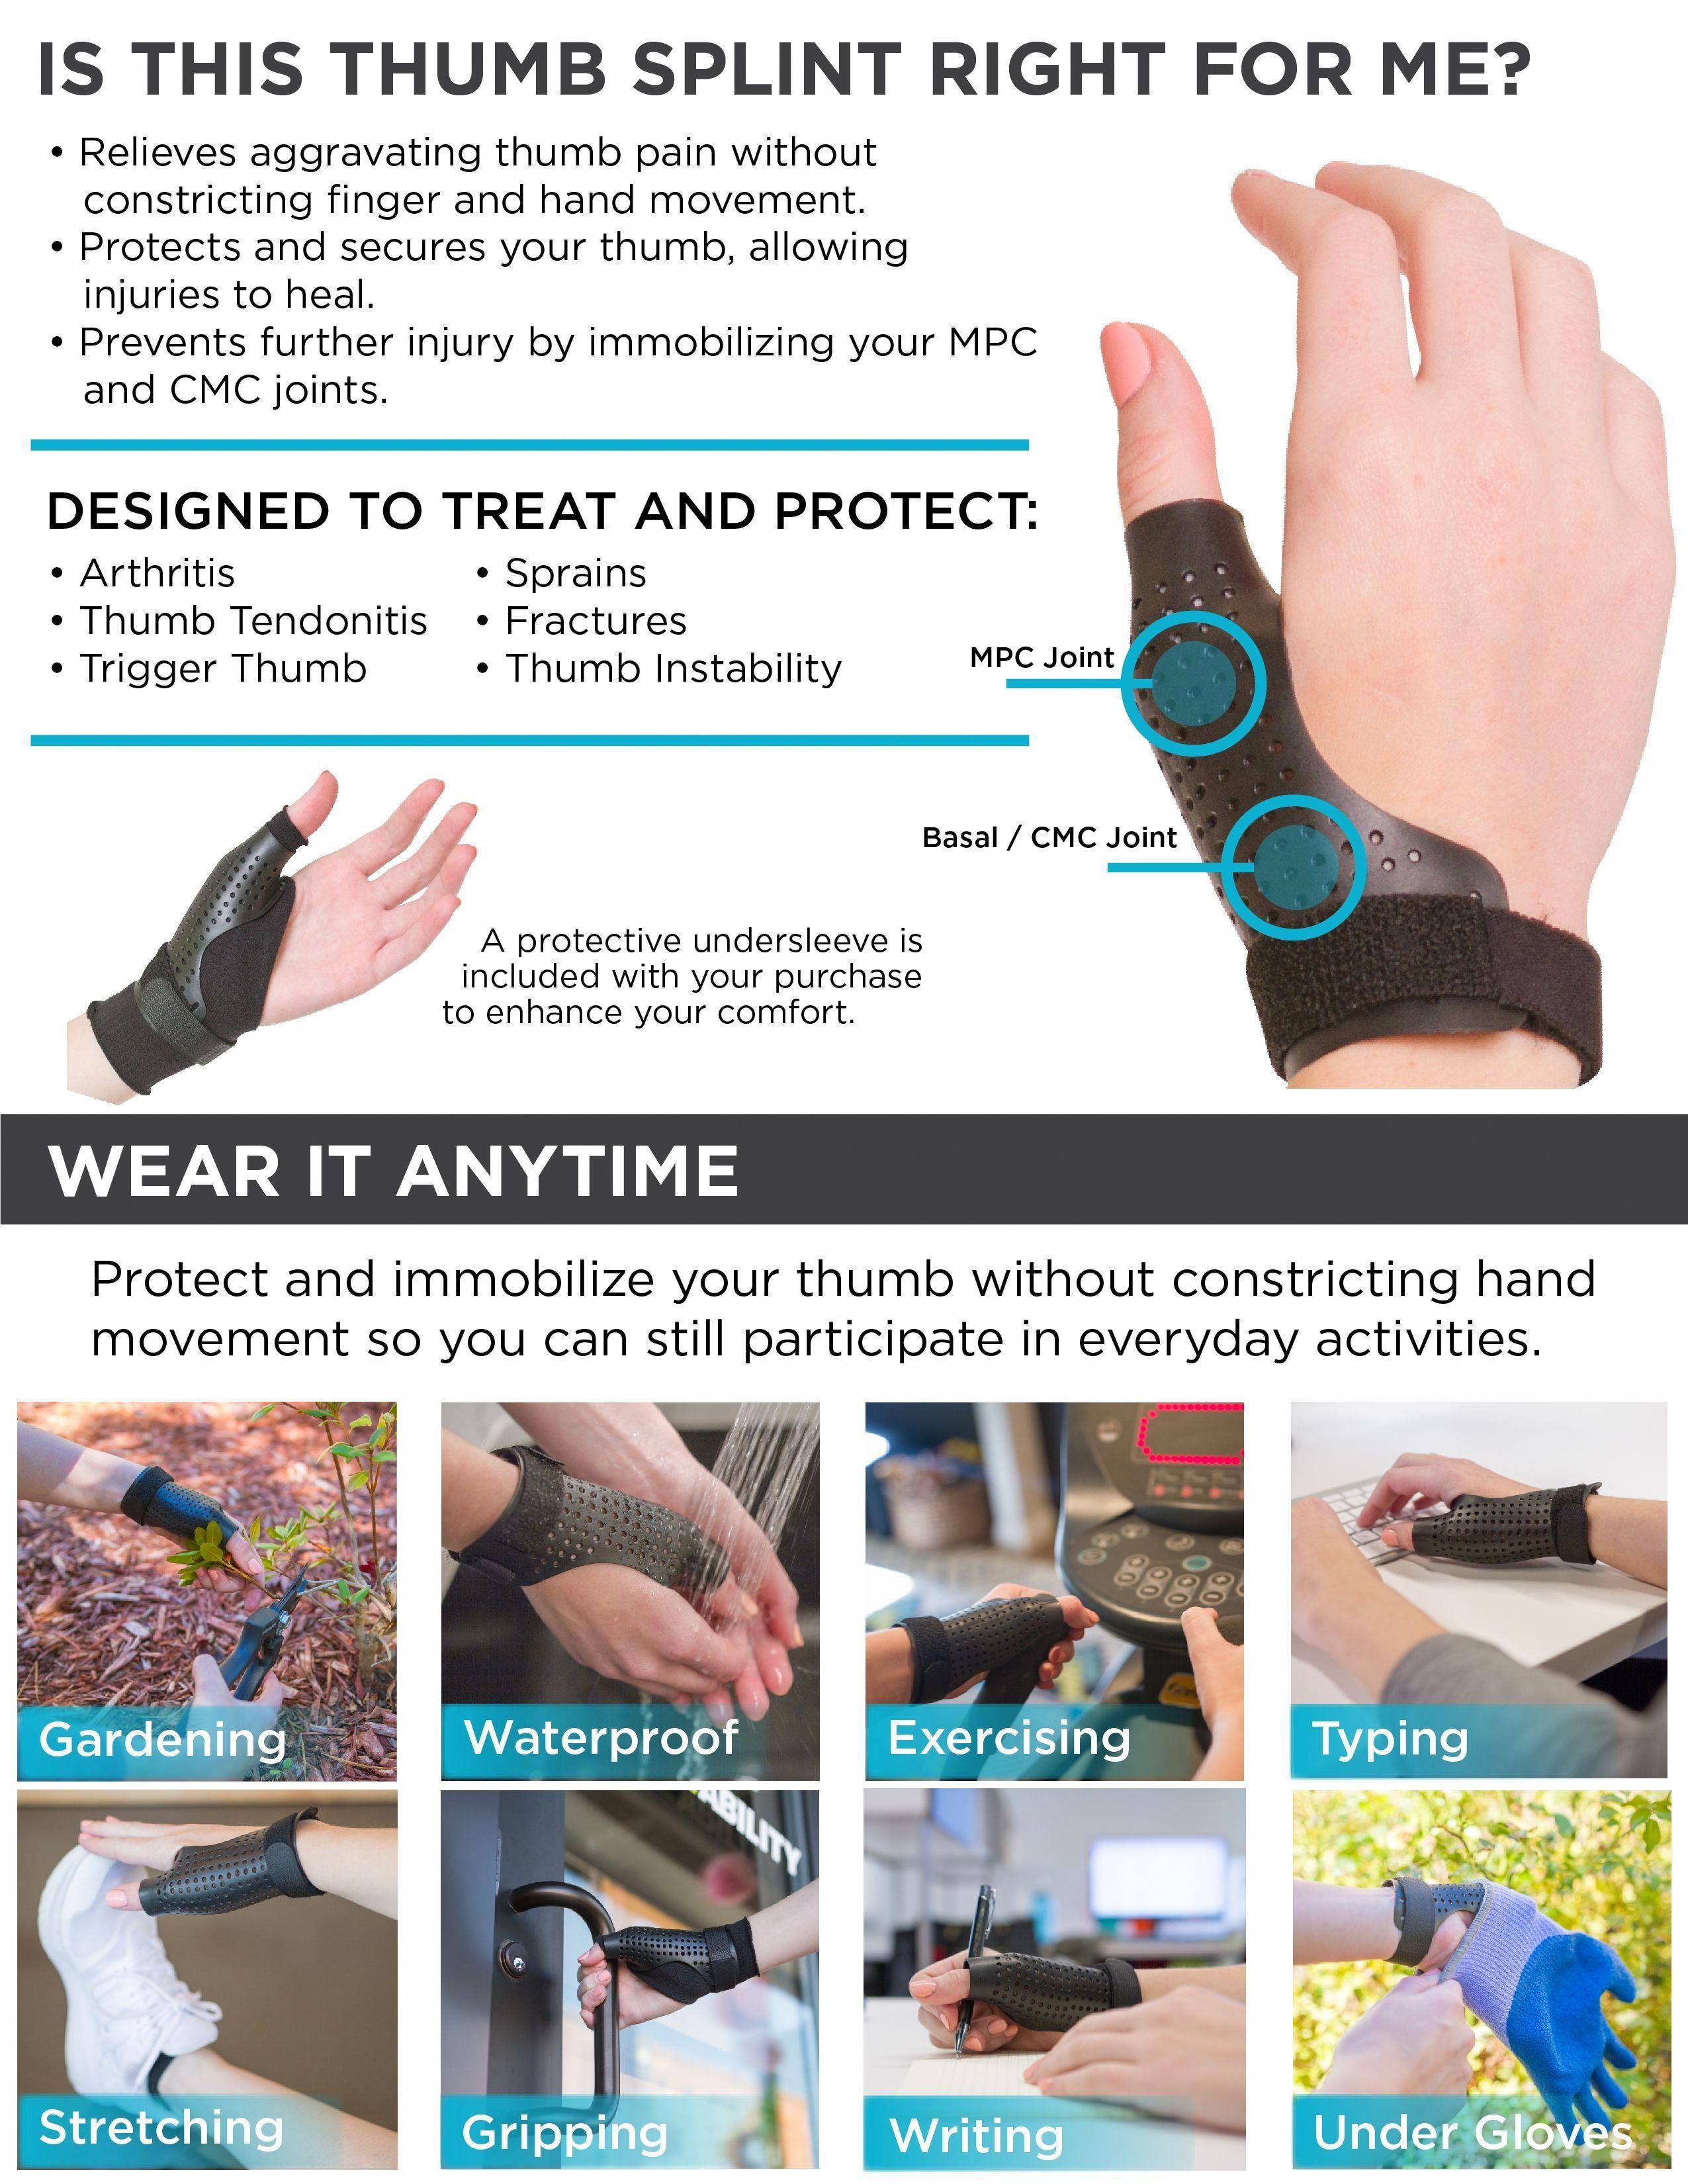 Hard Plastic Thumb Splint and Arthritis Treatment Brace to Immobilize &  Stabilize Your Thumb Joint #rheumatoidarthritissymptoms